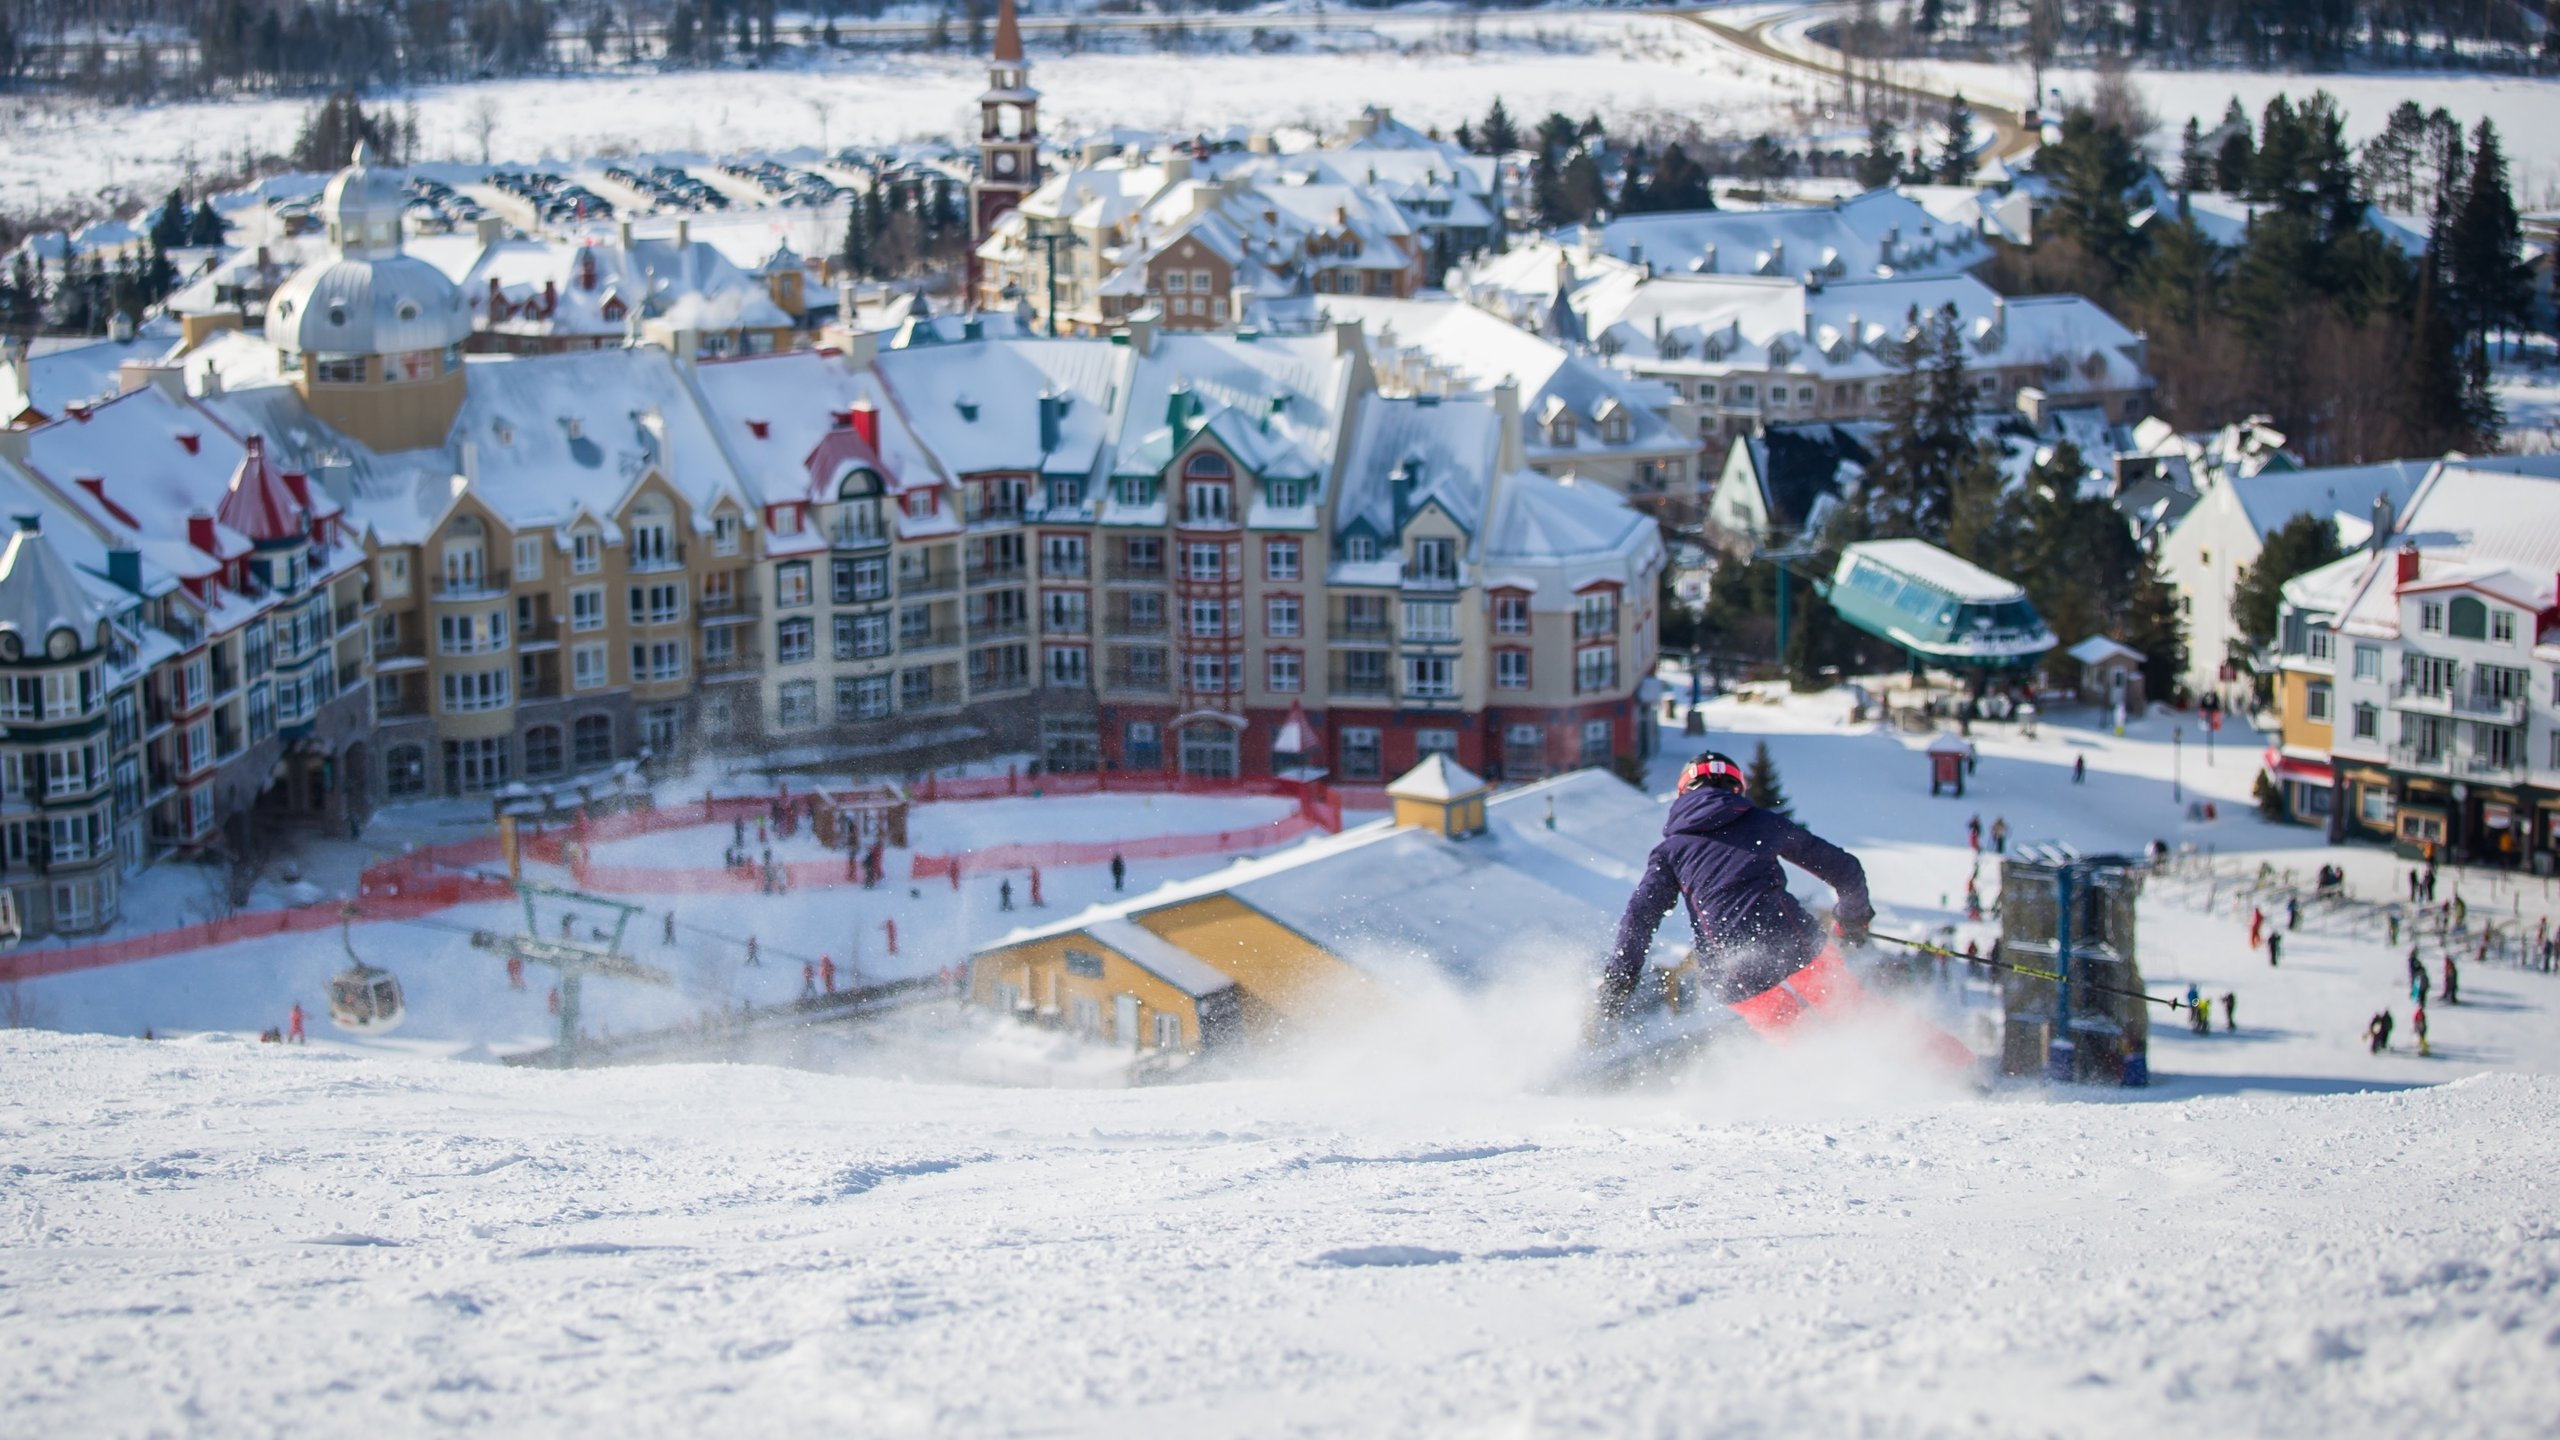 Mont-Tremblant Ski Resort, Mont-Tremblant, Quebec, Canada